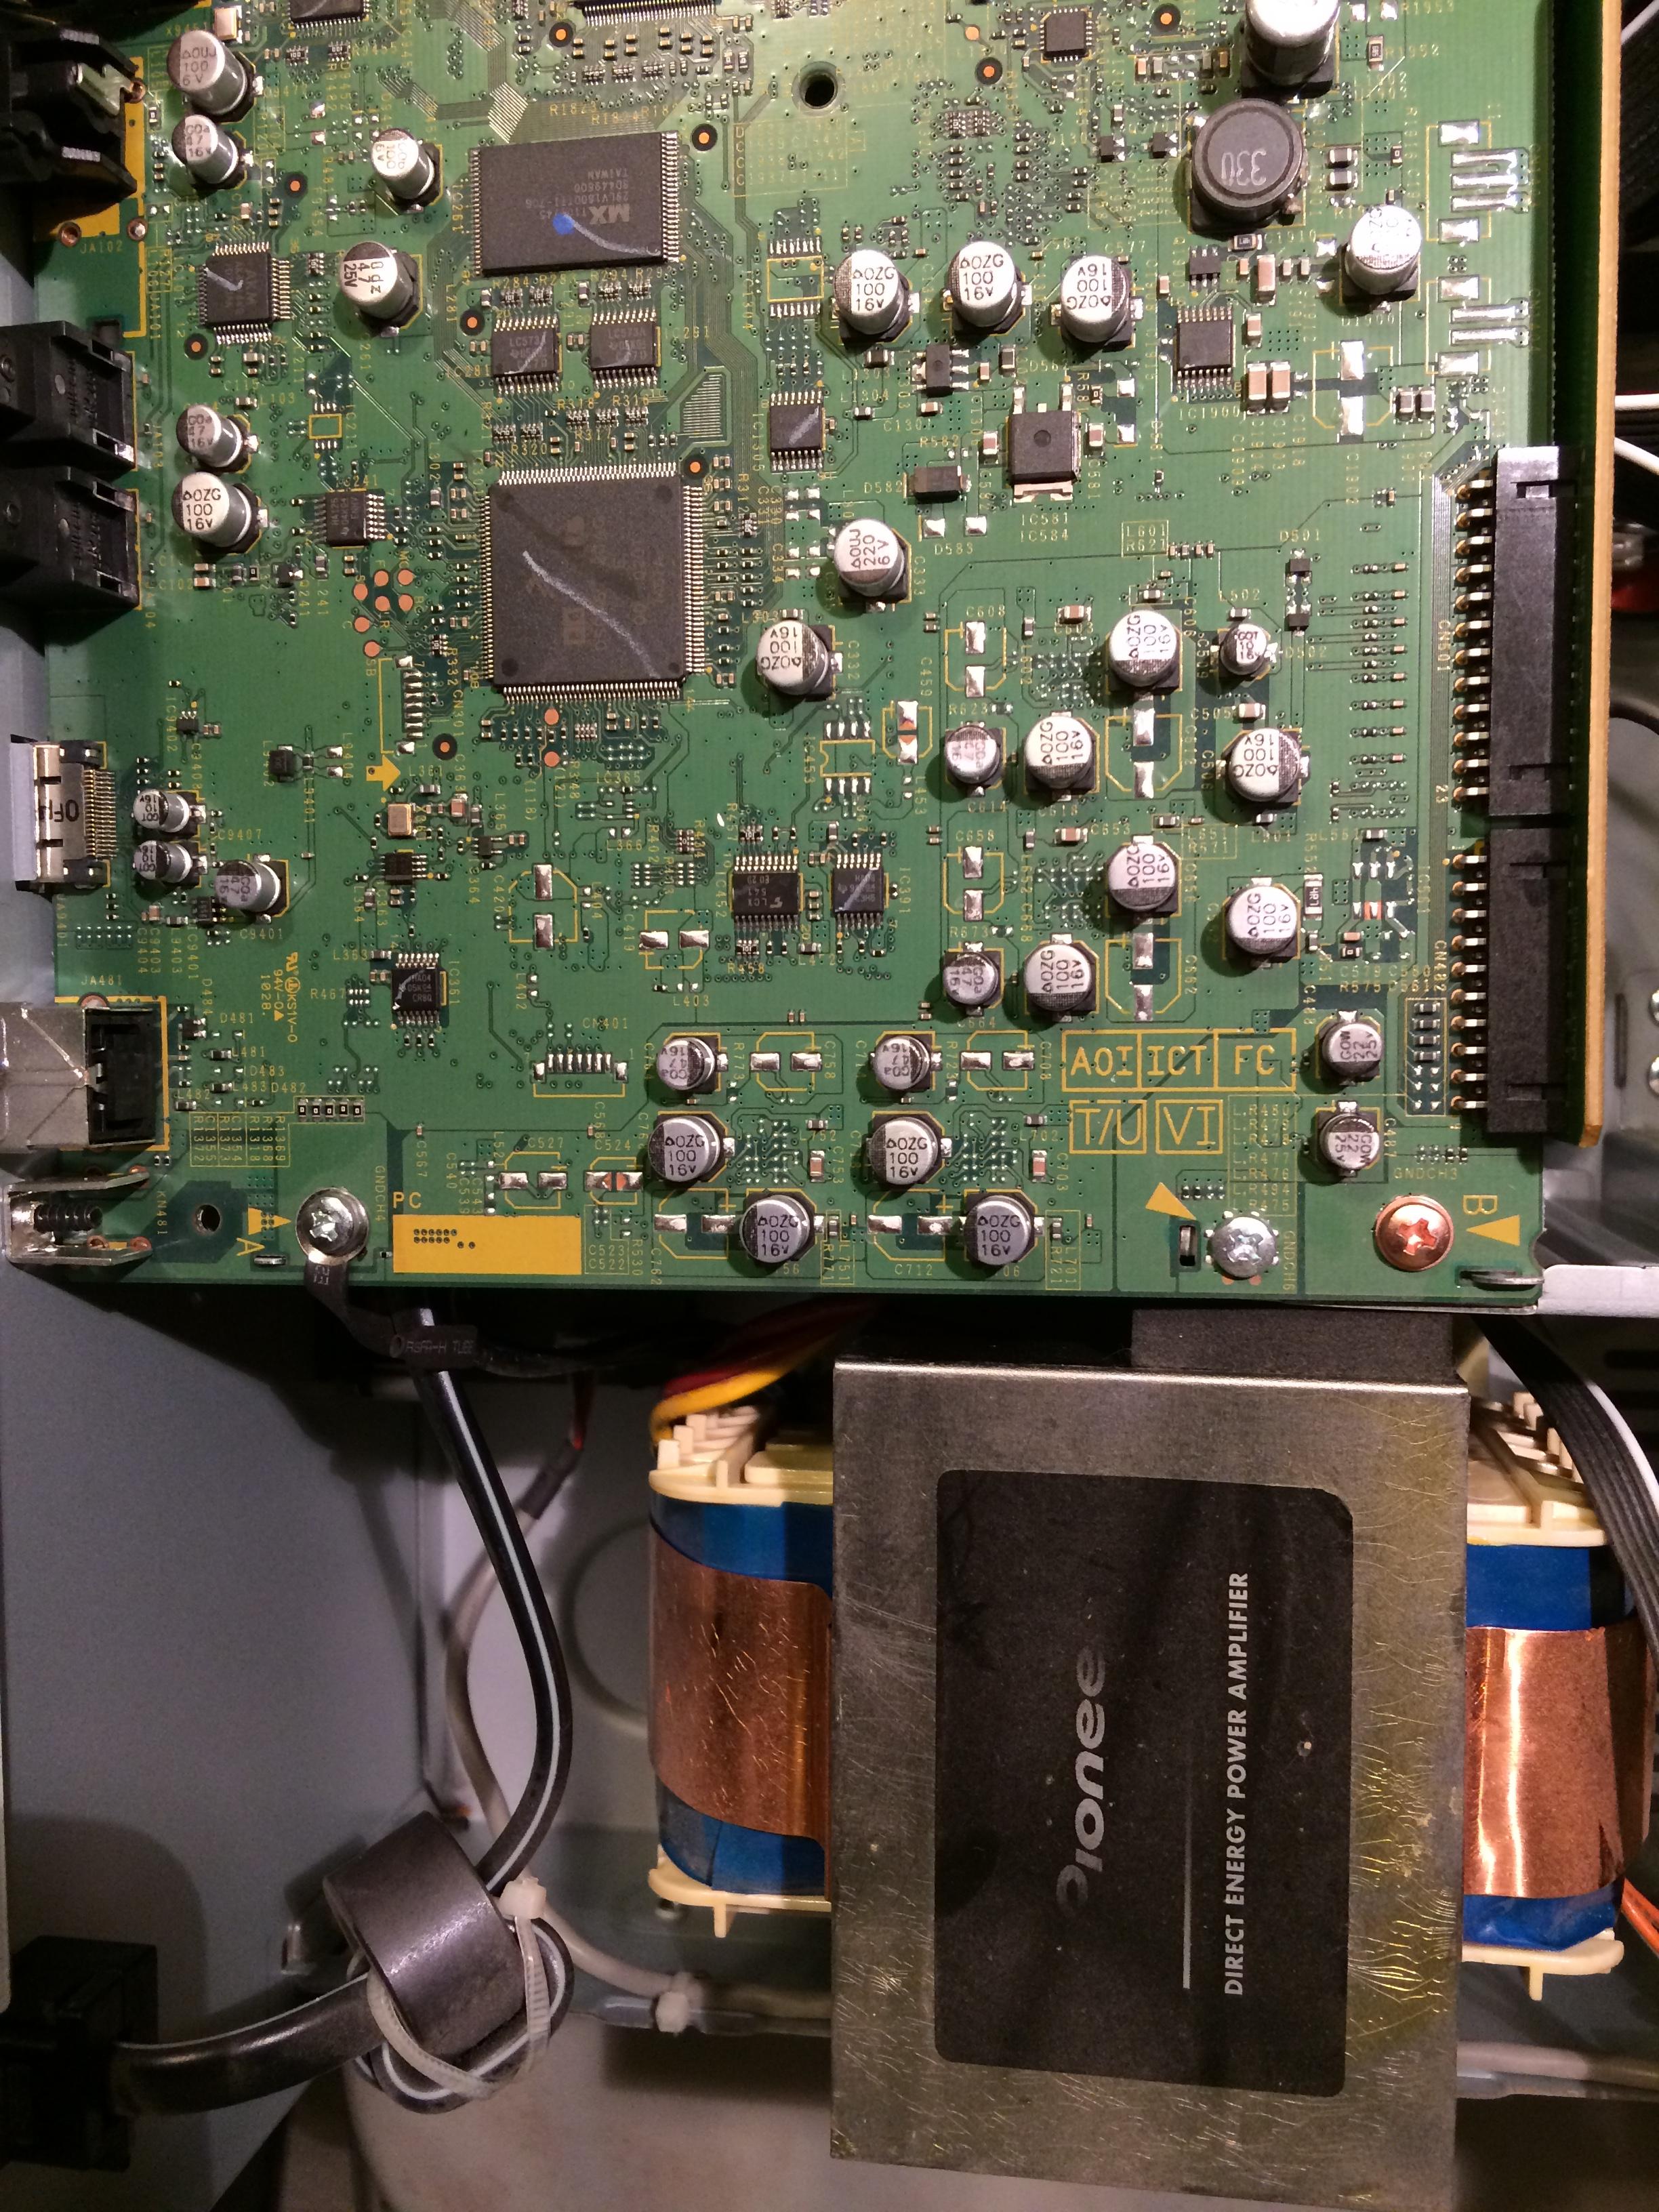 Pioneer VSX-925 Flashing PQLS Light